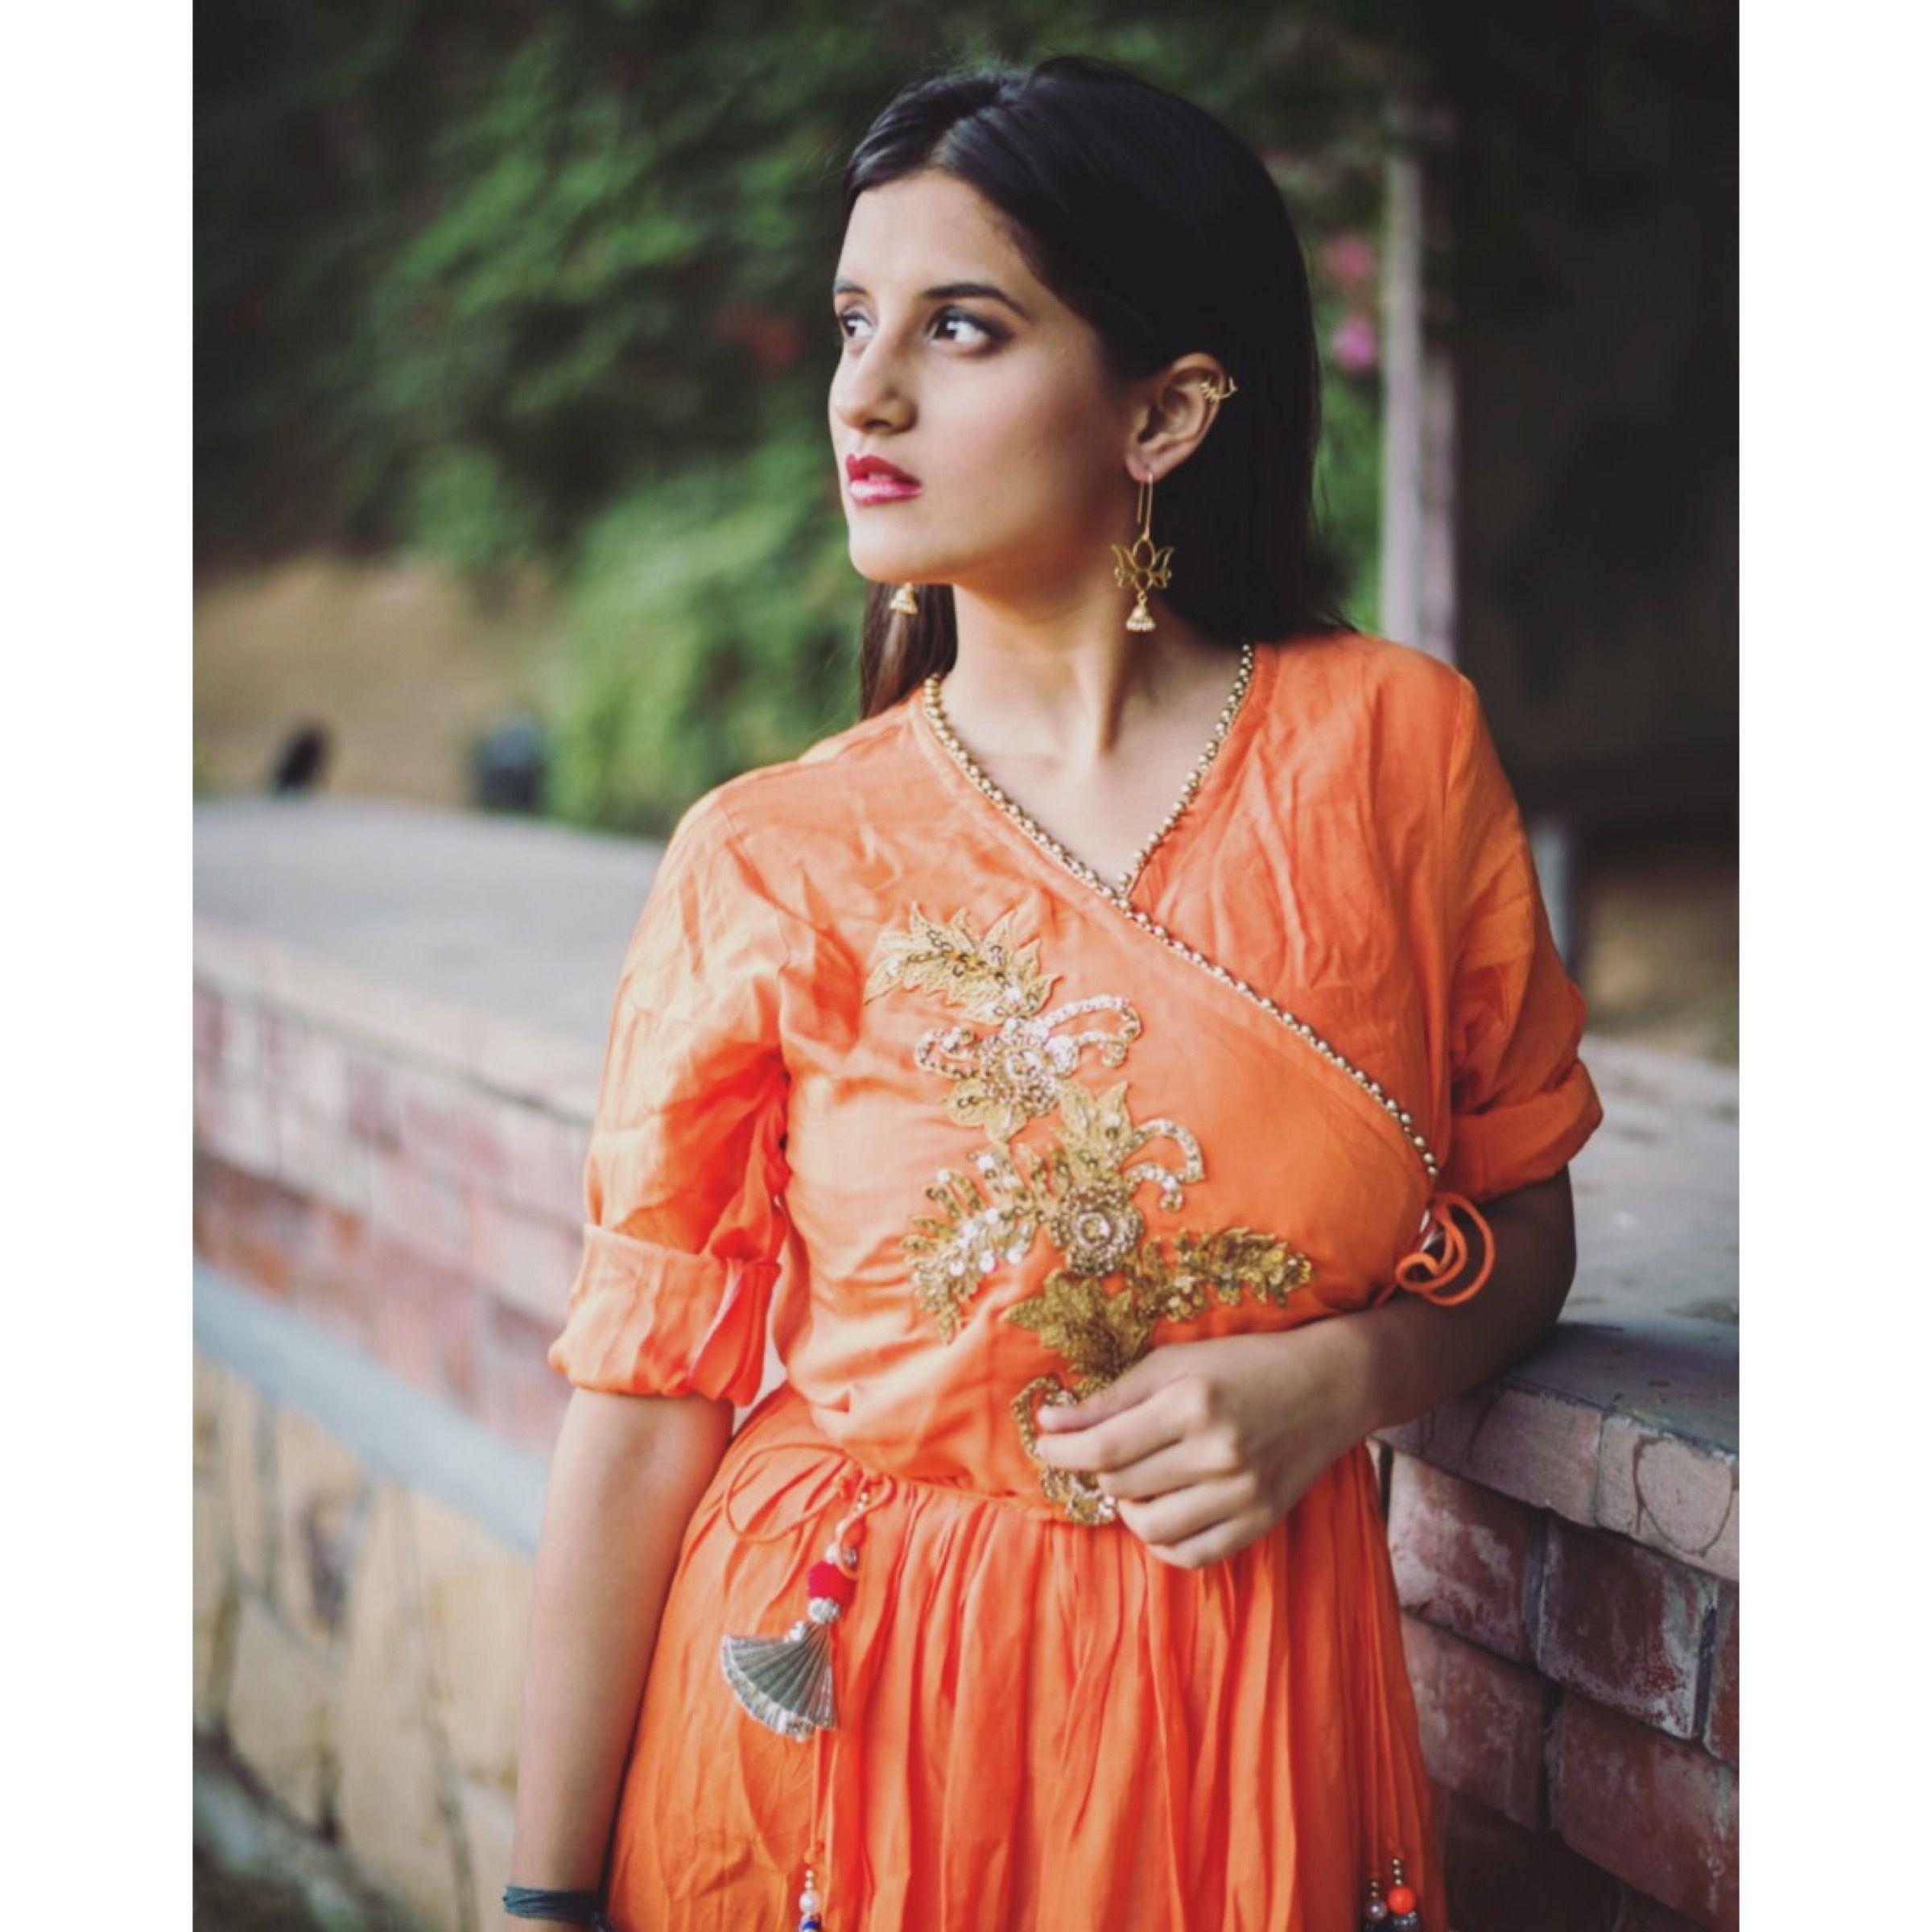 Outfit designsbynishthabhandari photographer mrotographer